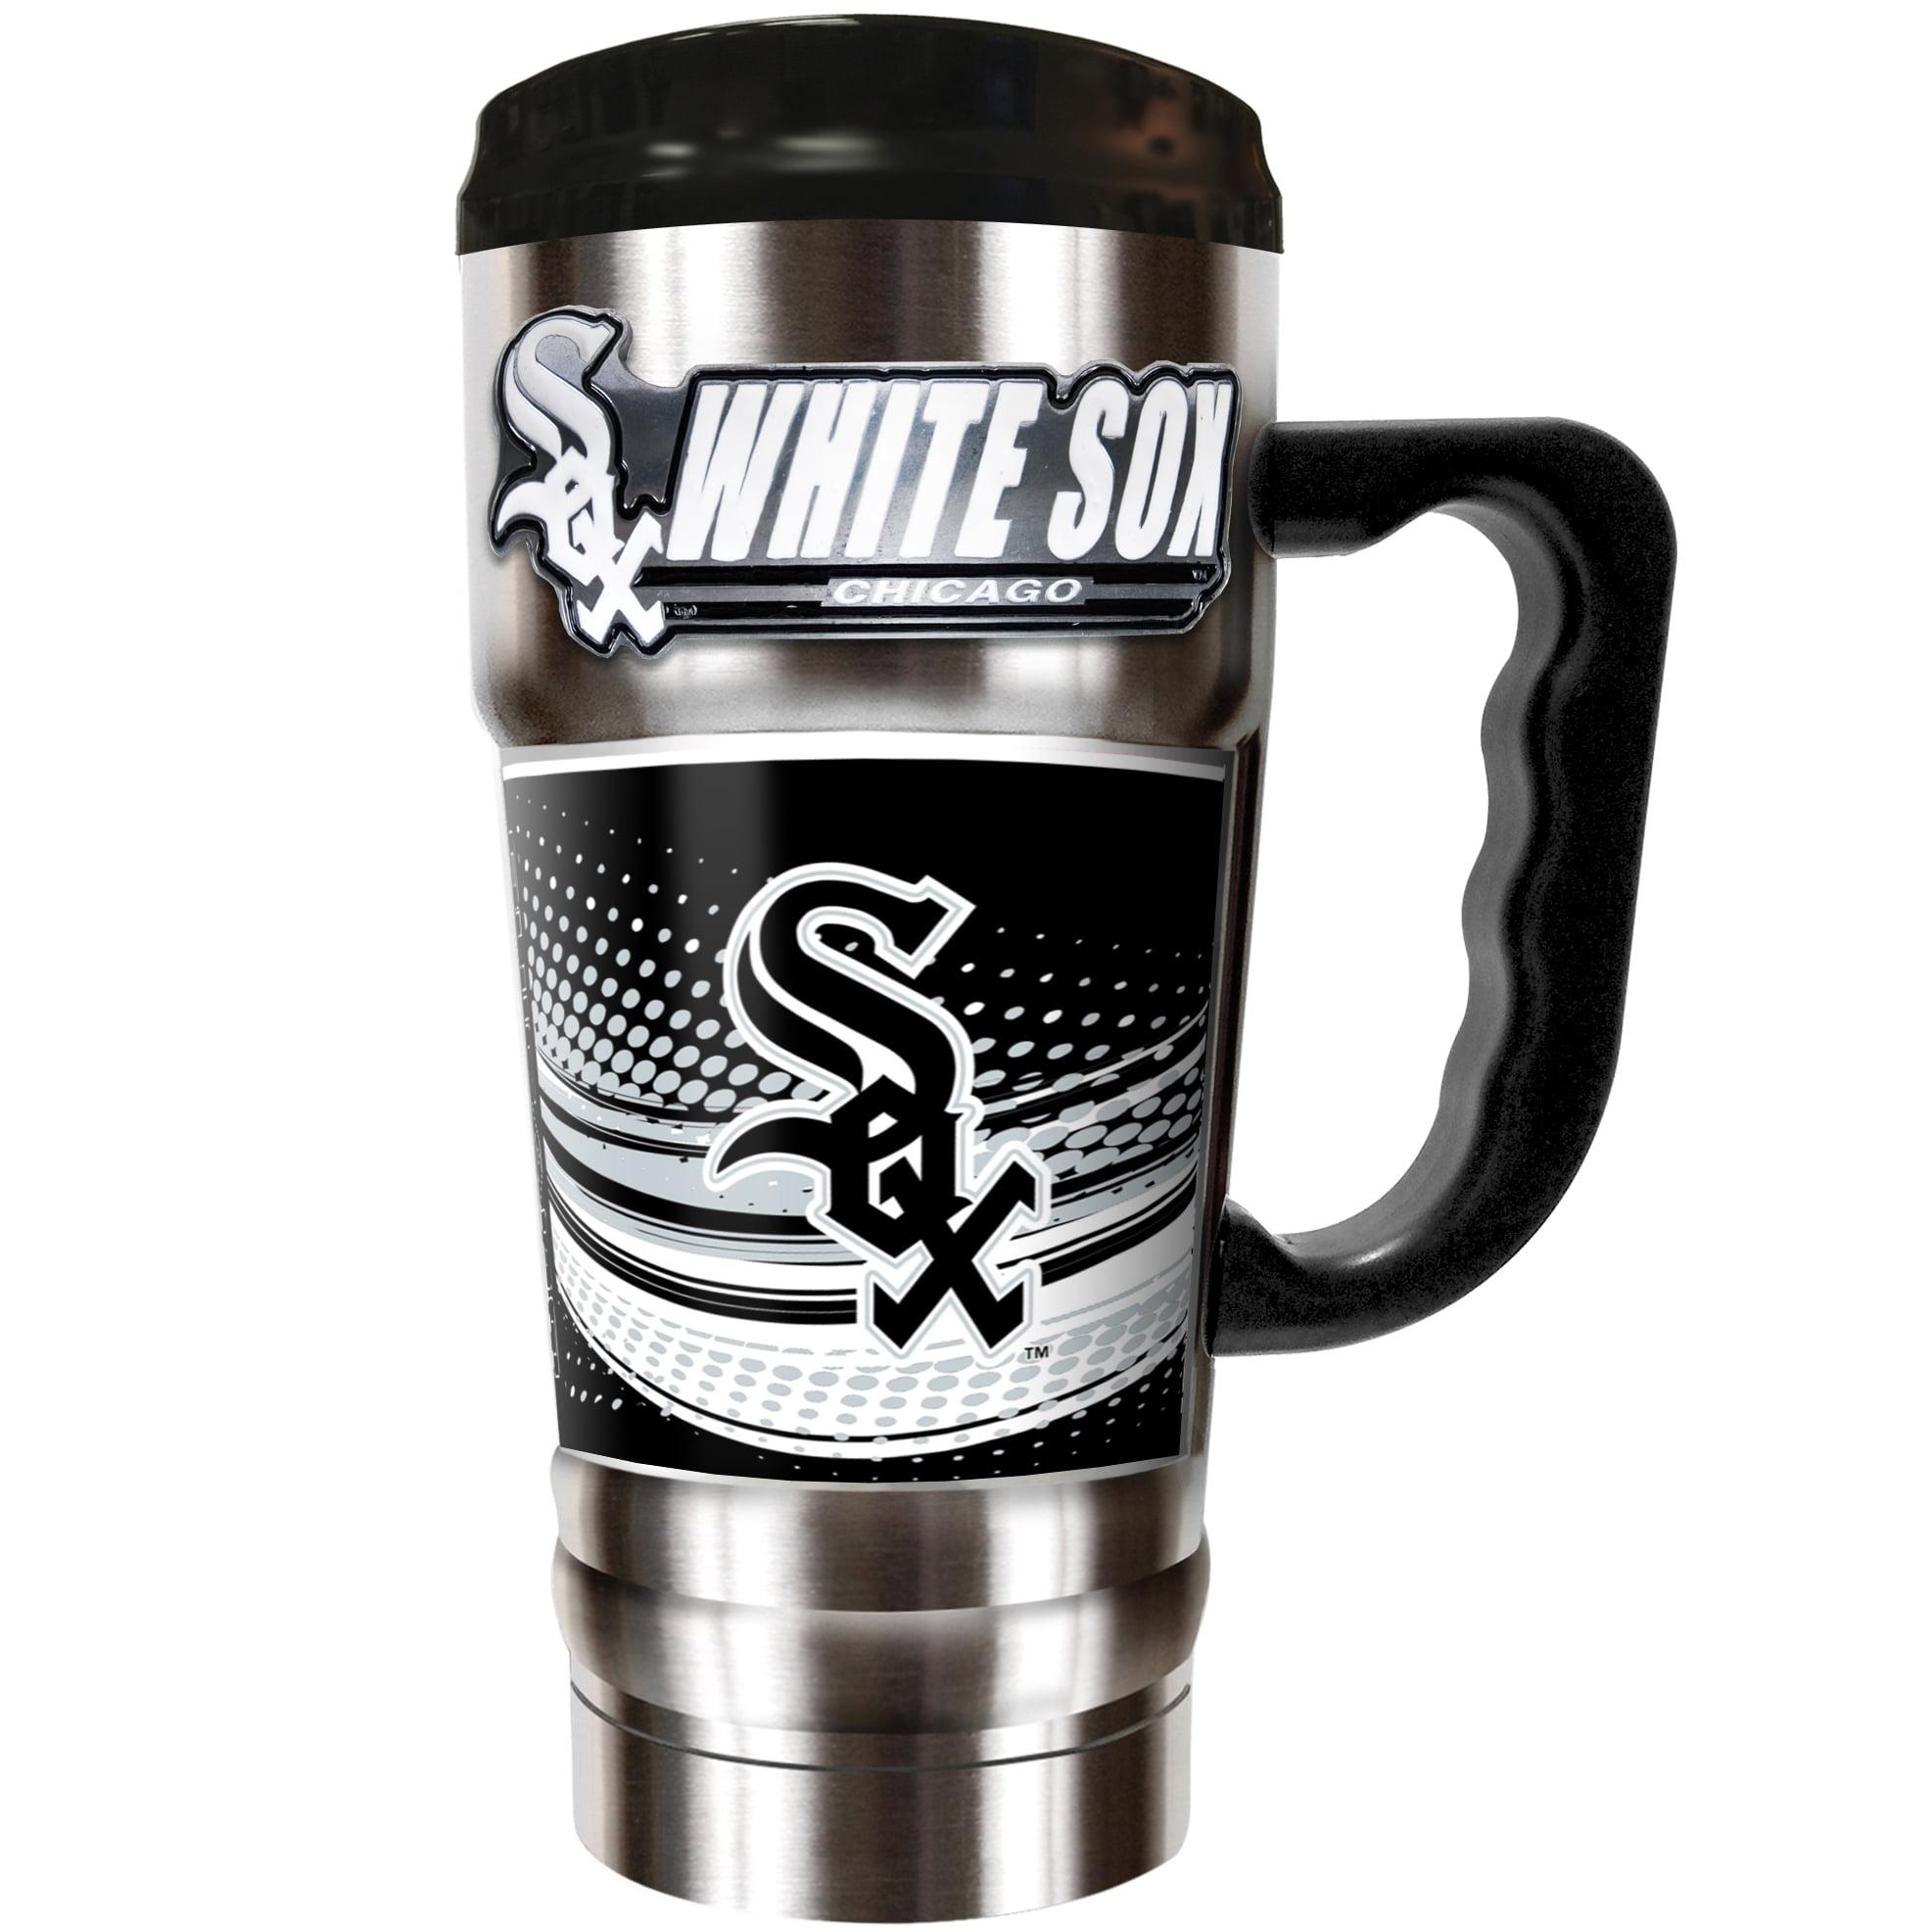 Chicago White Sox The Champ 20 oz. Travel Tumbler - Silver - No Size